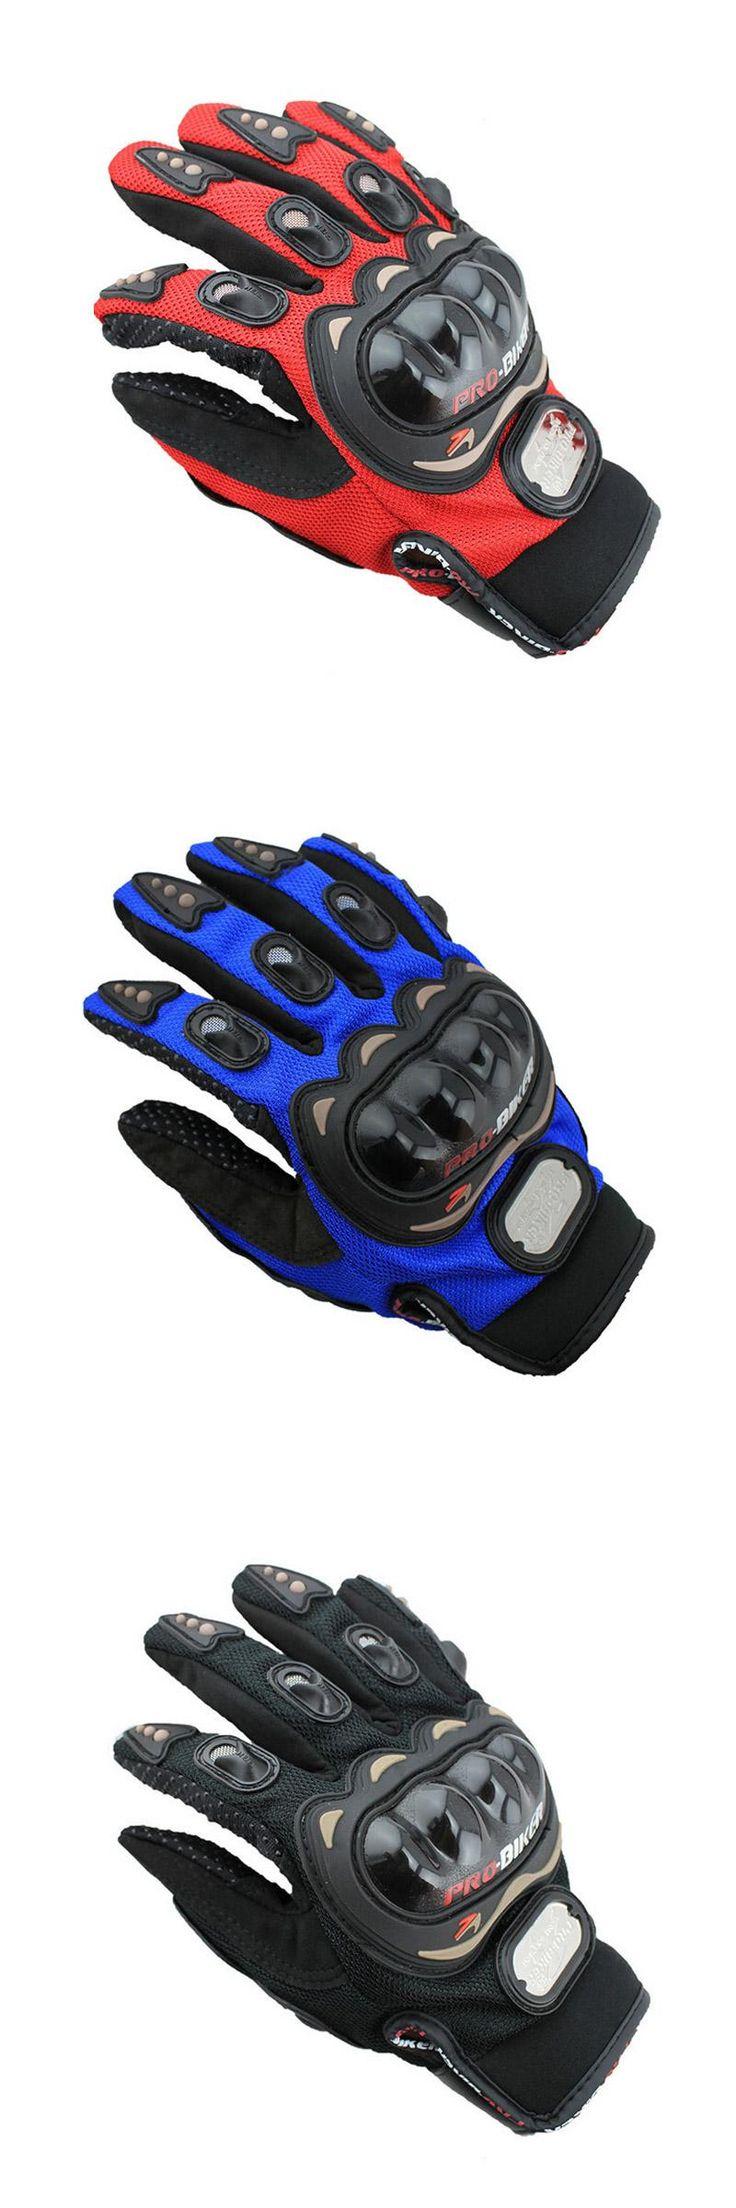 [Visit to Buy] Pro-Biker Motorcycle Gloves MOTO Racing gloves Knight Urban Riders Luvas Motocross Motorbike Gloves guantes ciclismo invierno XL #Advertisement